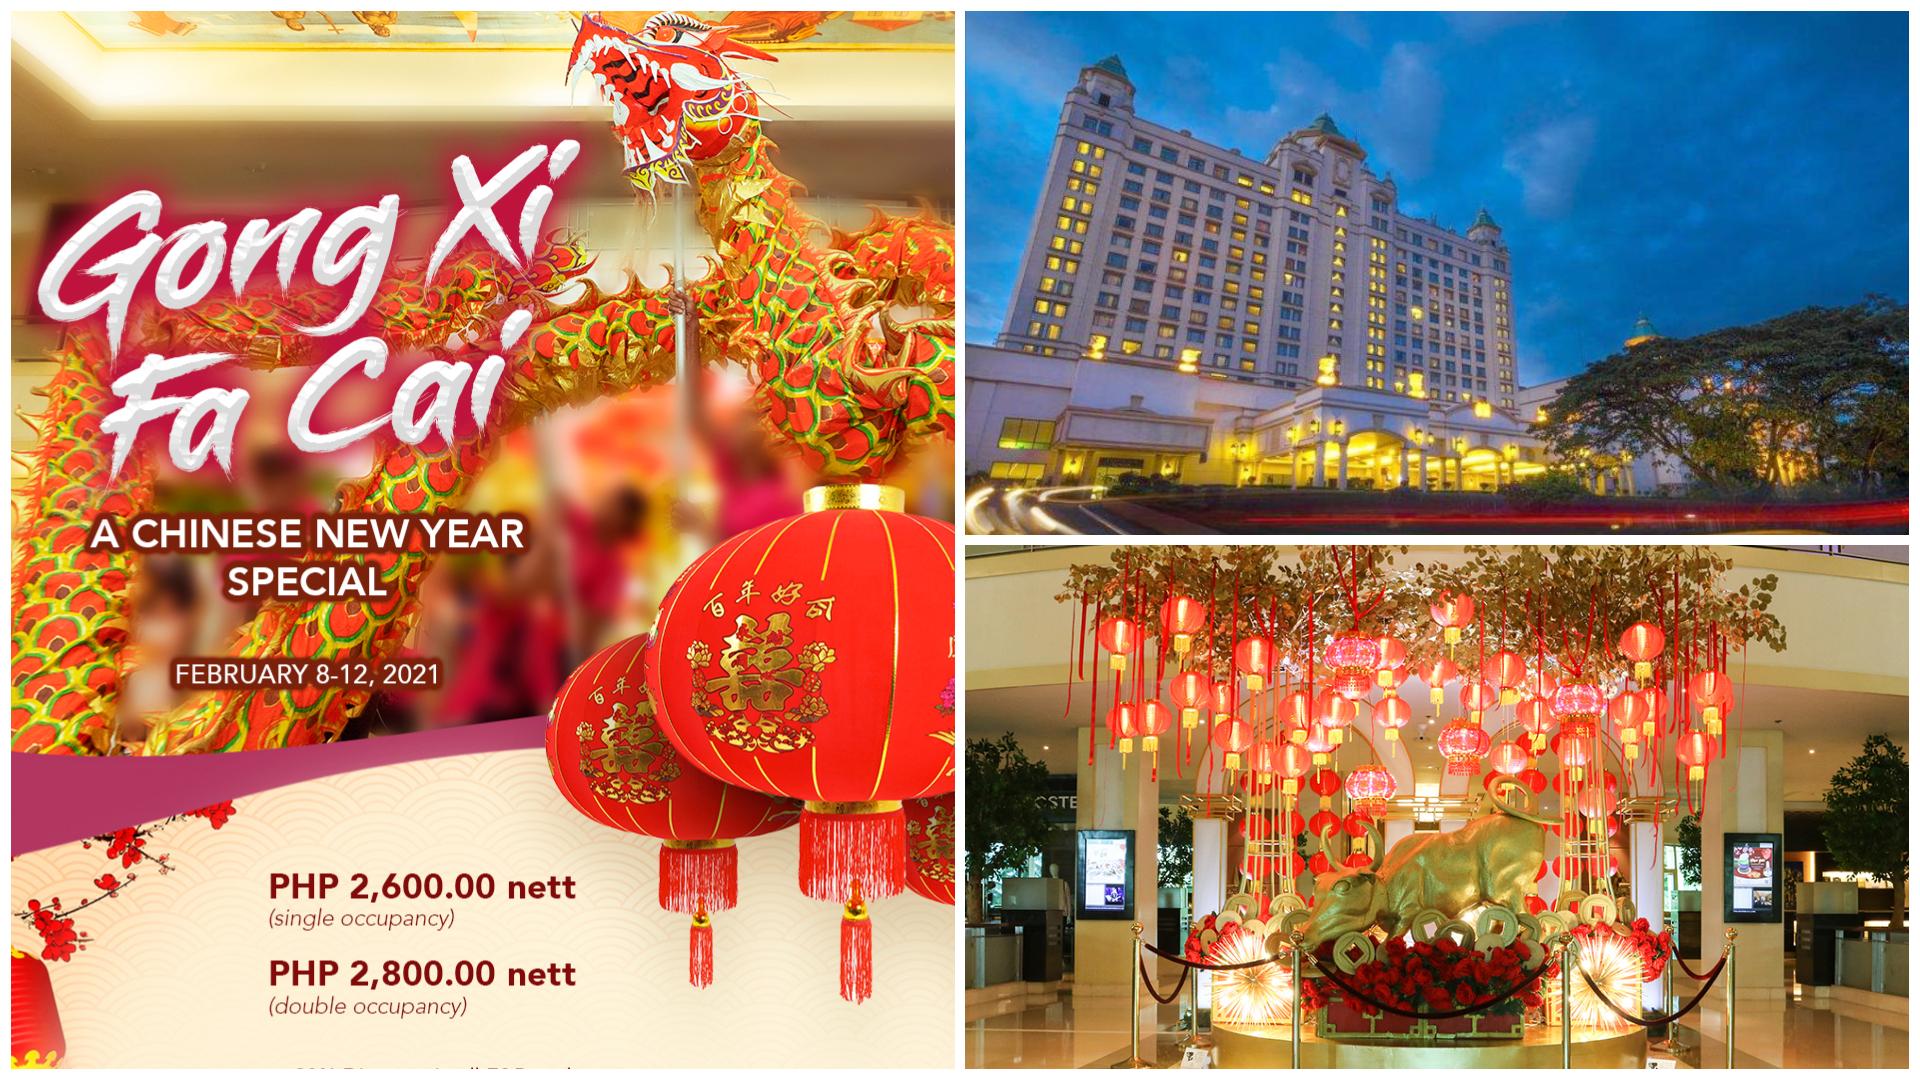 Christmas In Cebu 2021 List Chinese New Year Promos At Waterfront Cebu Sugbo Ph Cebu